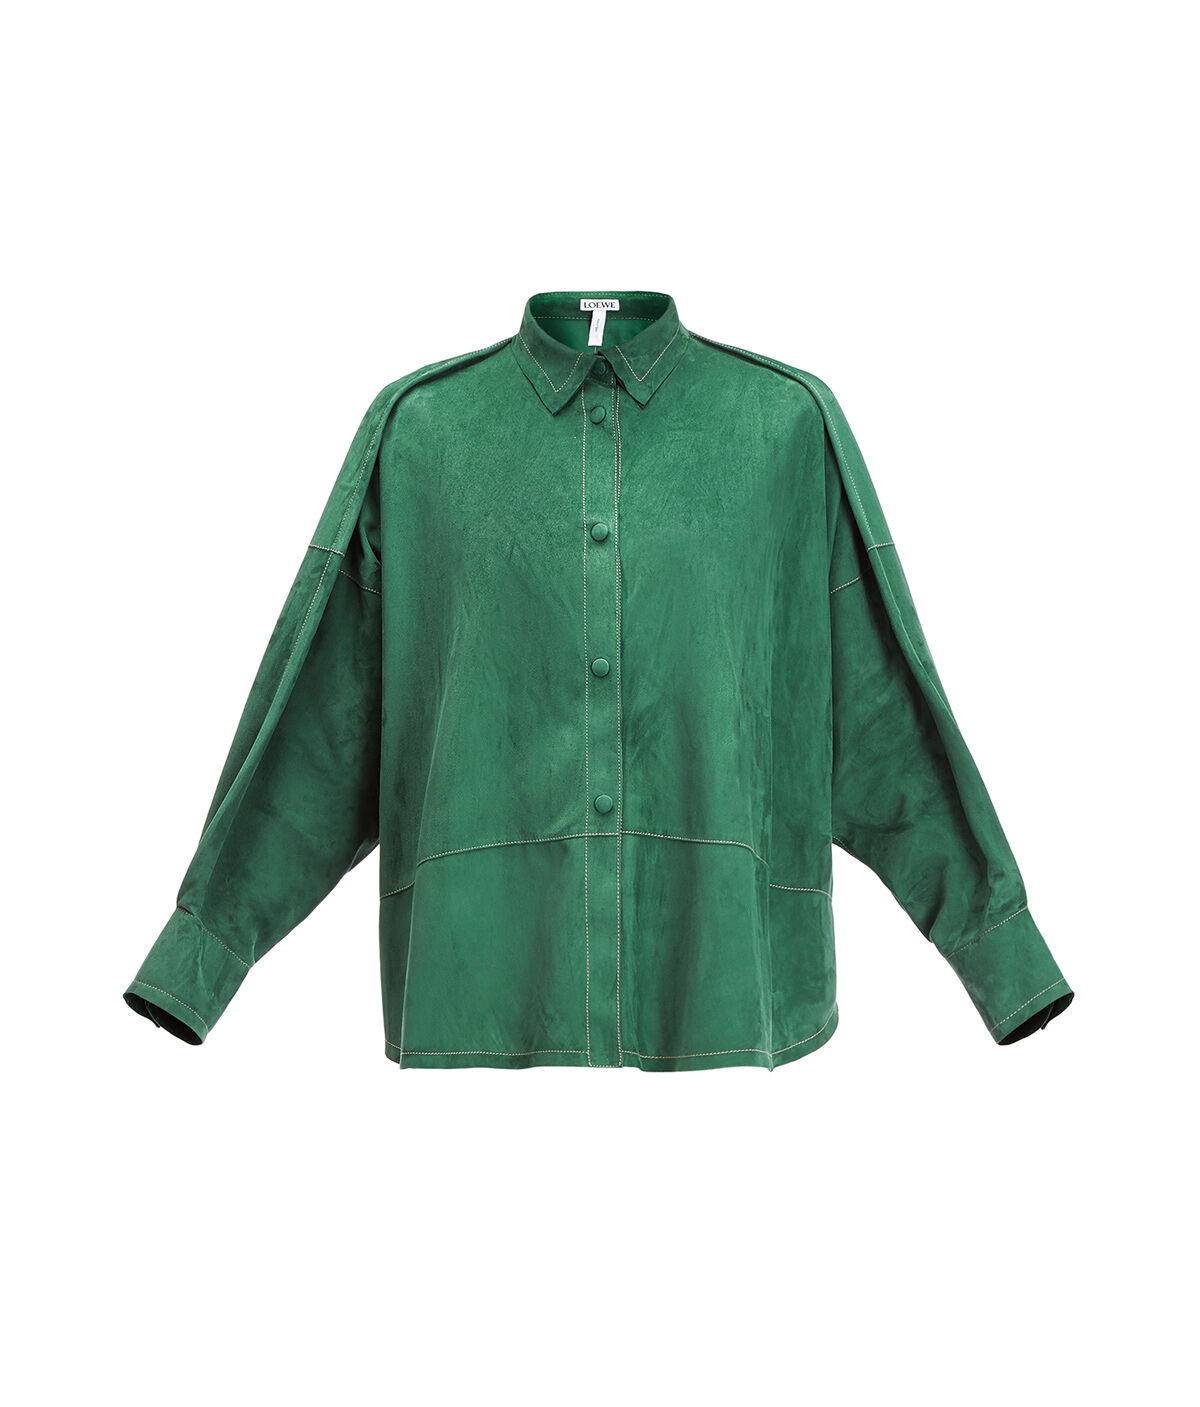 LOEWE Oversize Shirt 绿色 all